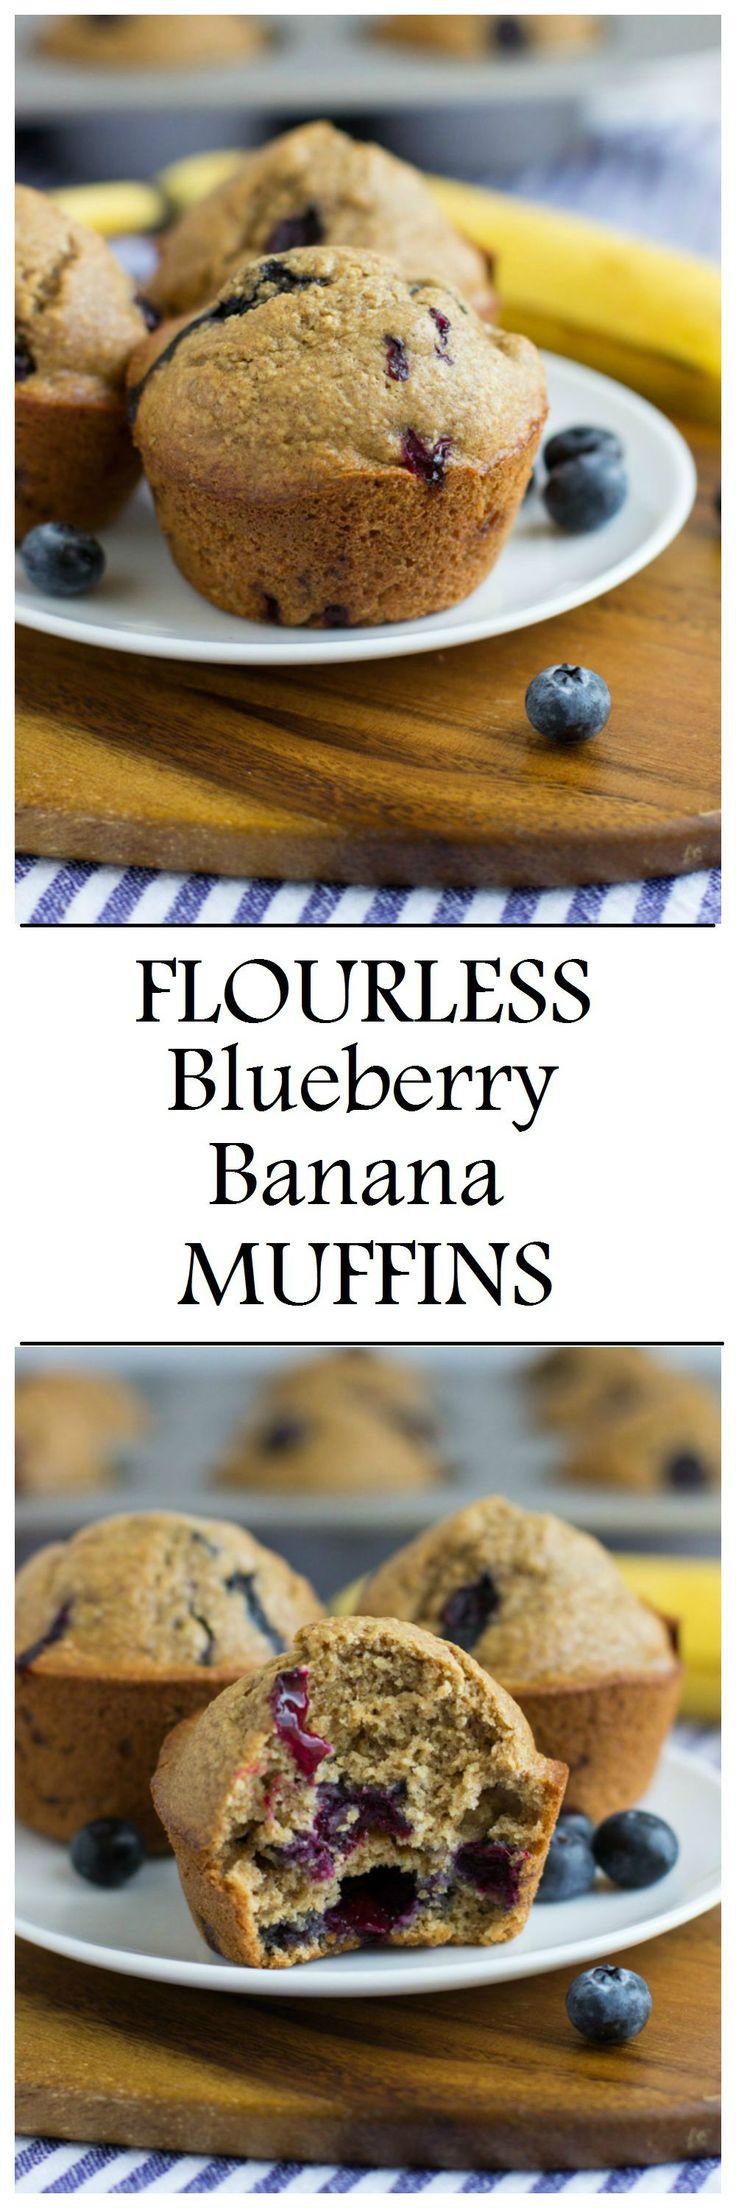 Healthy Flourless Blueberry Banana Muffins- made easy in a blender! #glutenfree #oilfree #dairyfree #refinedsugarfree